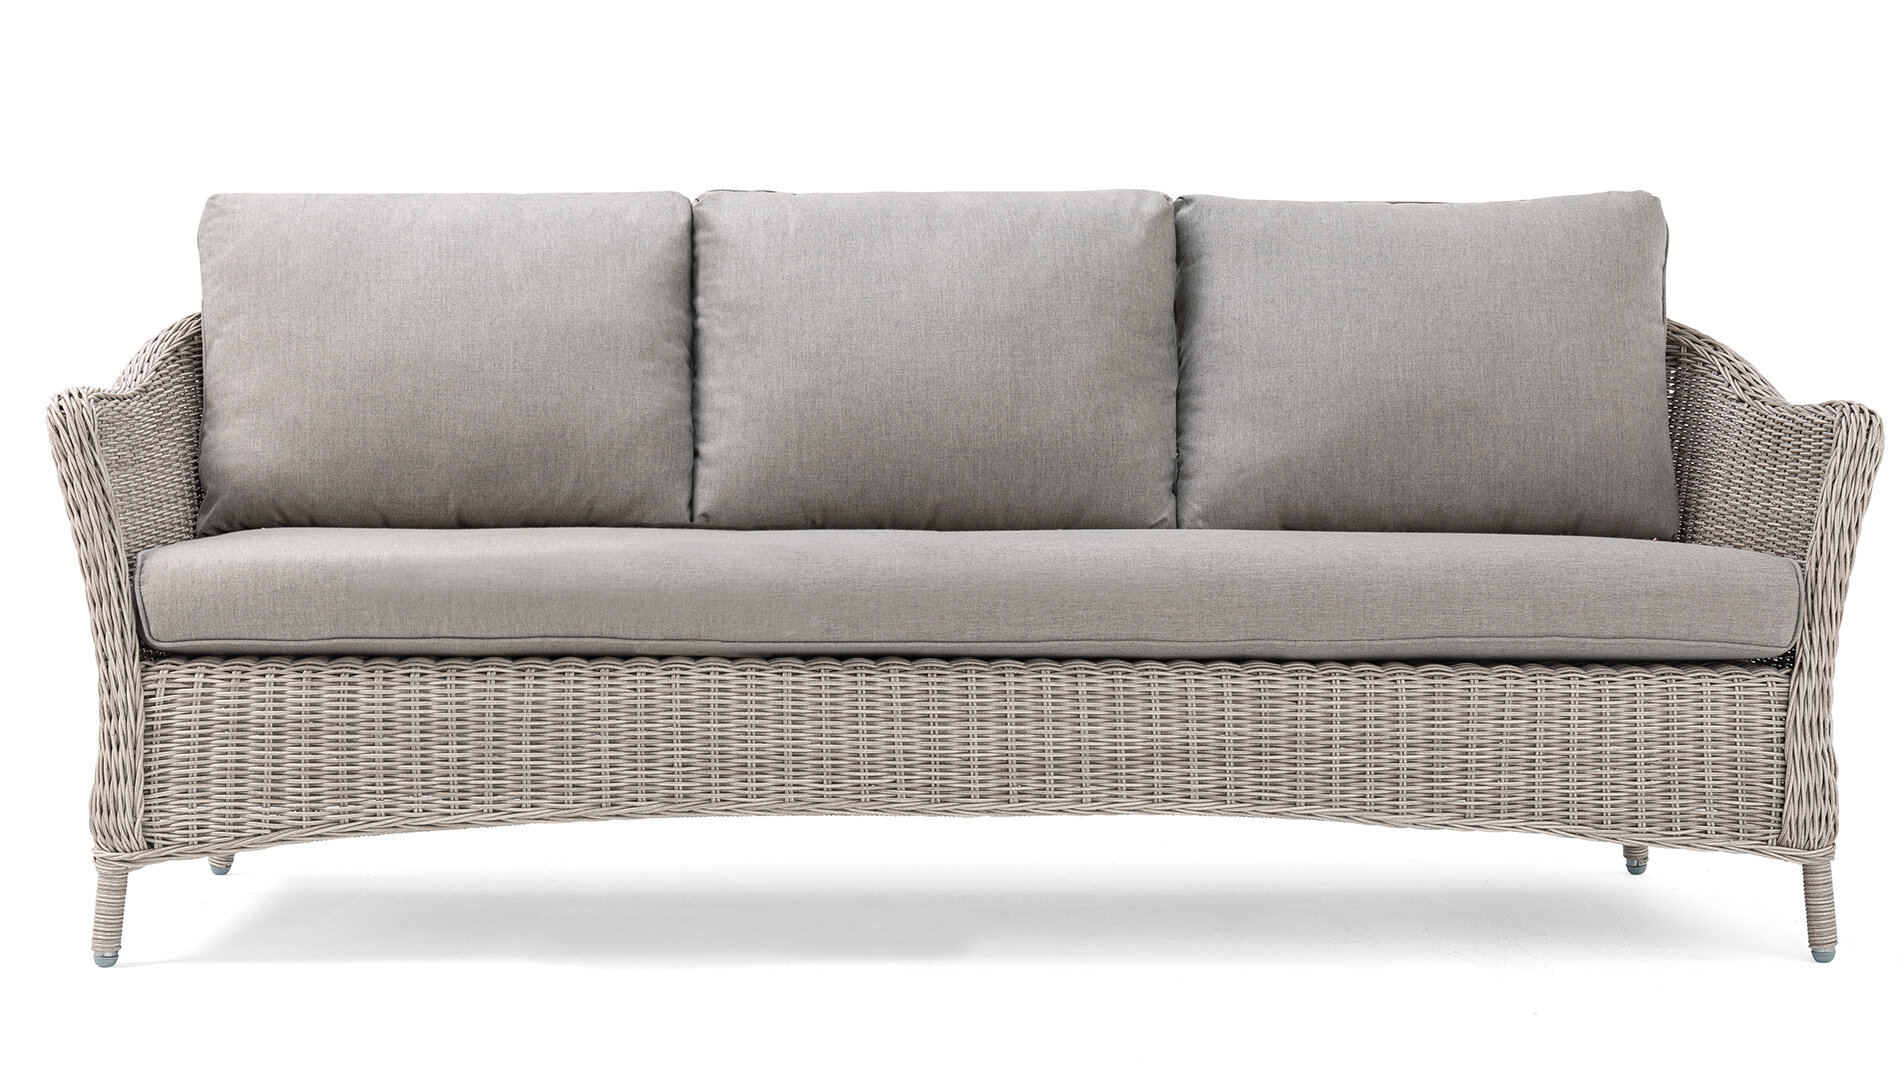 La Z Boy Laurel Patio Sofa With Sunbrella Cushions Wayfair